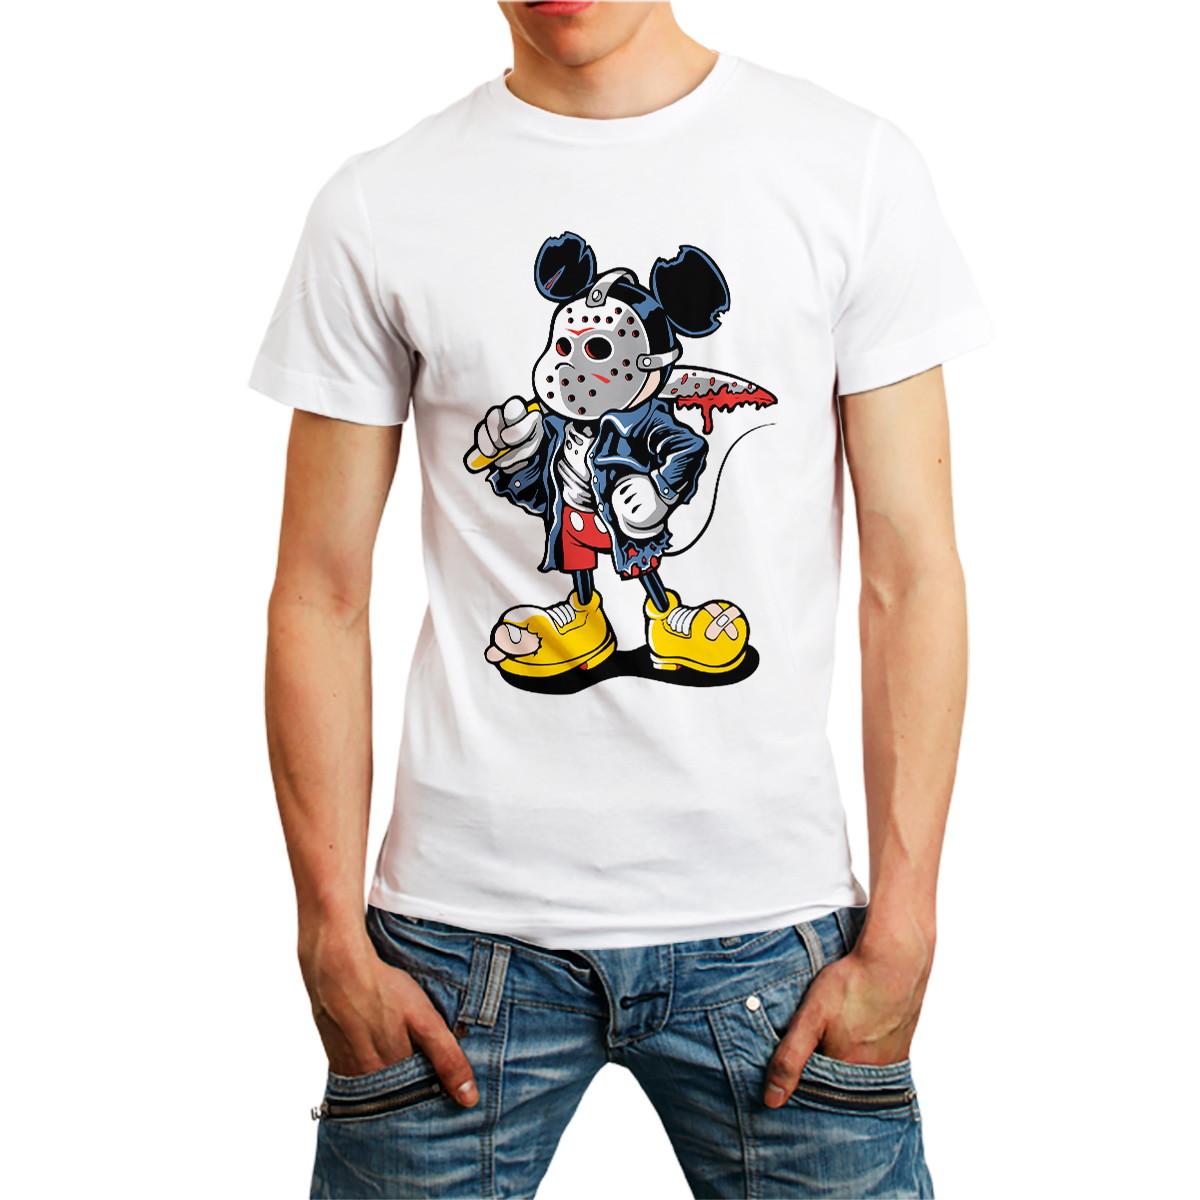 7ea1054135 Camiseta Camisa Masculina Mickey Jason Personagem Disney no Elo7 ...